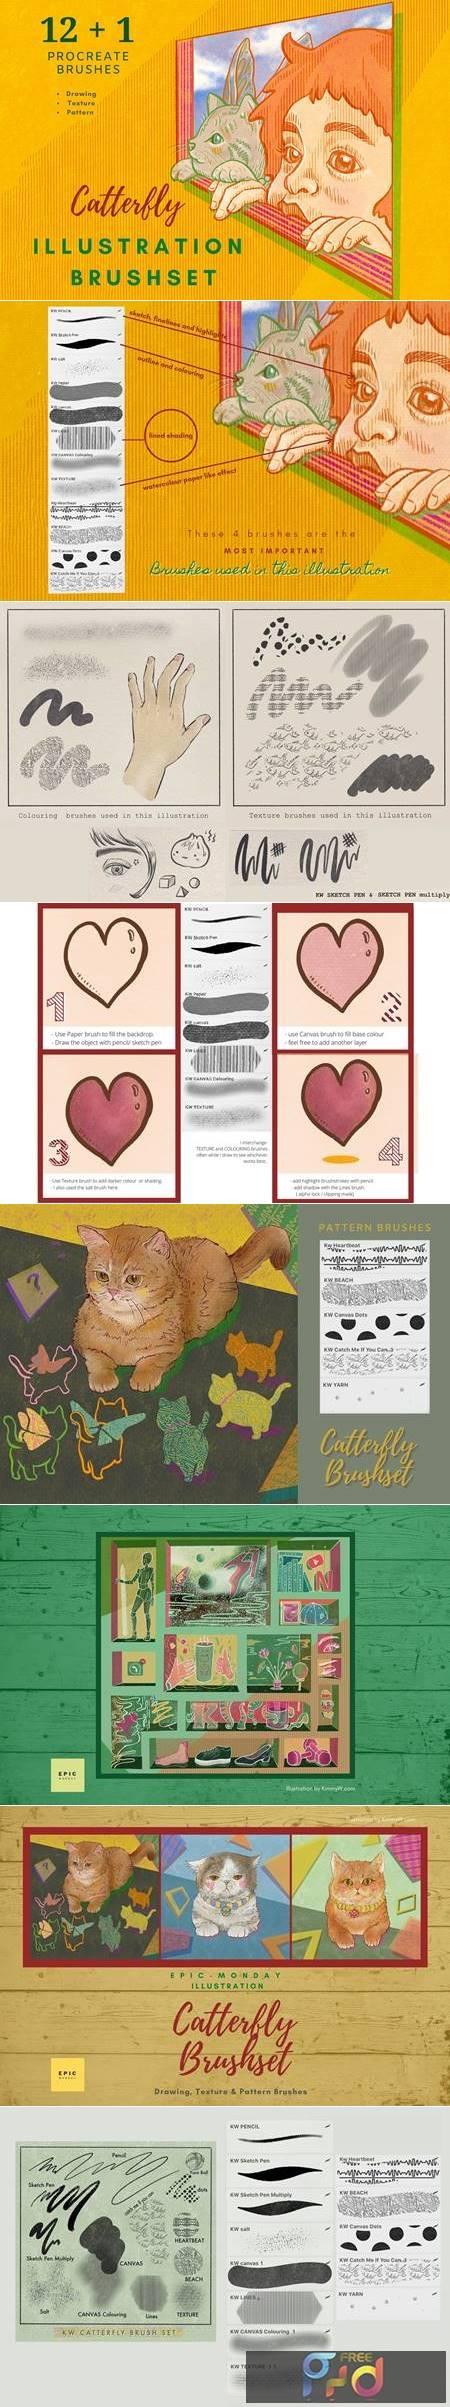 Procreate Illustration Brushes Vol 1 5503319 1